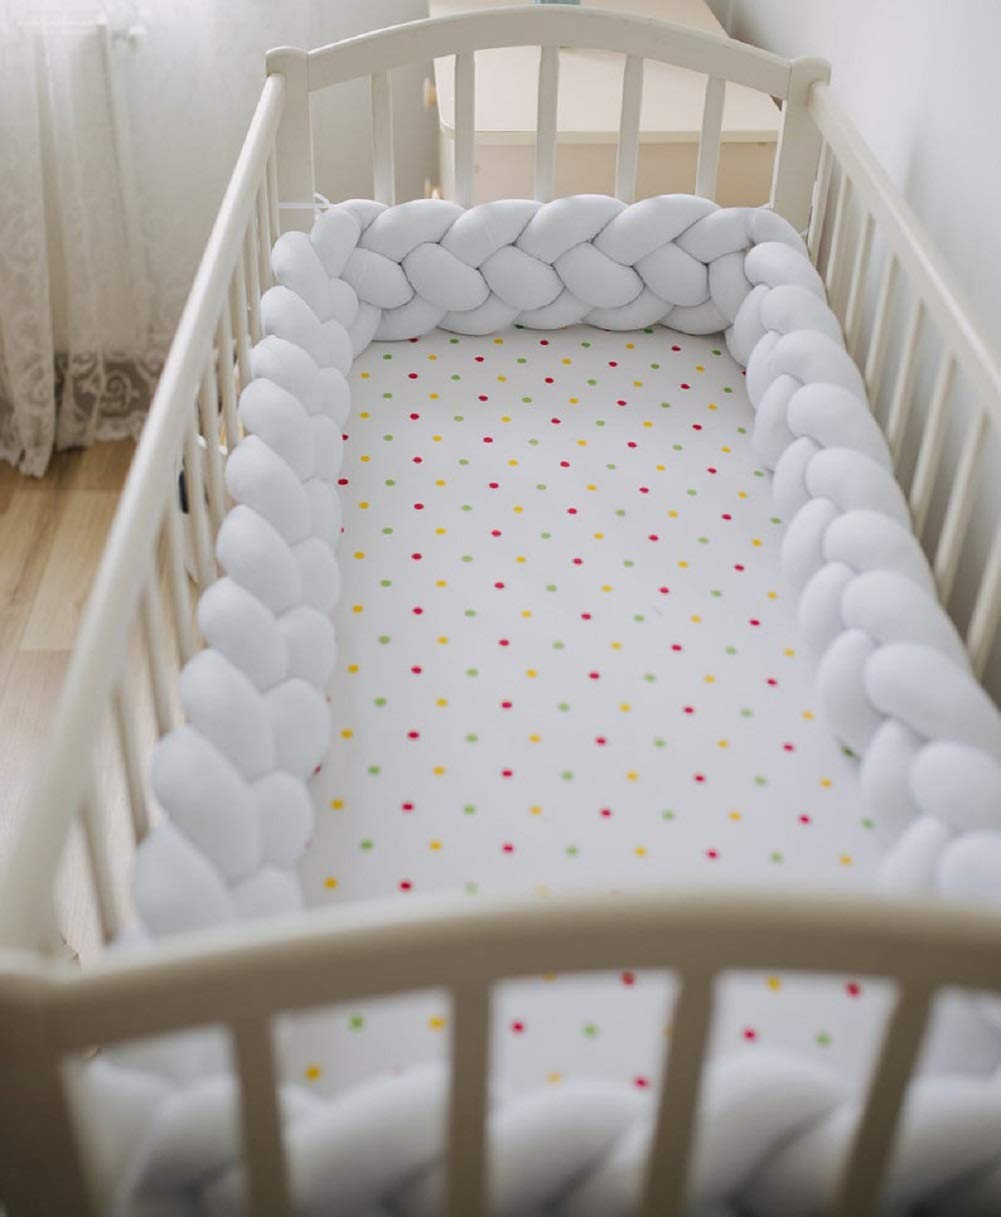 4 Strands Pink+White+Gray+Purple 156 inch Baby Crib Bumper Plush Knotted Braided Bumper Handmade Soft Knot Pillow Sleep Safety Nursery Cradle Decor Newborn Gift Crib Protector